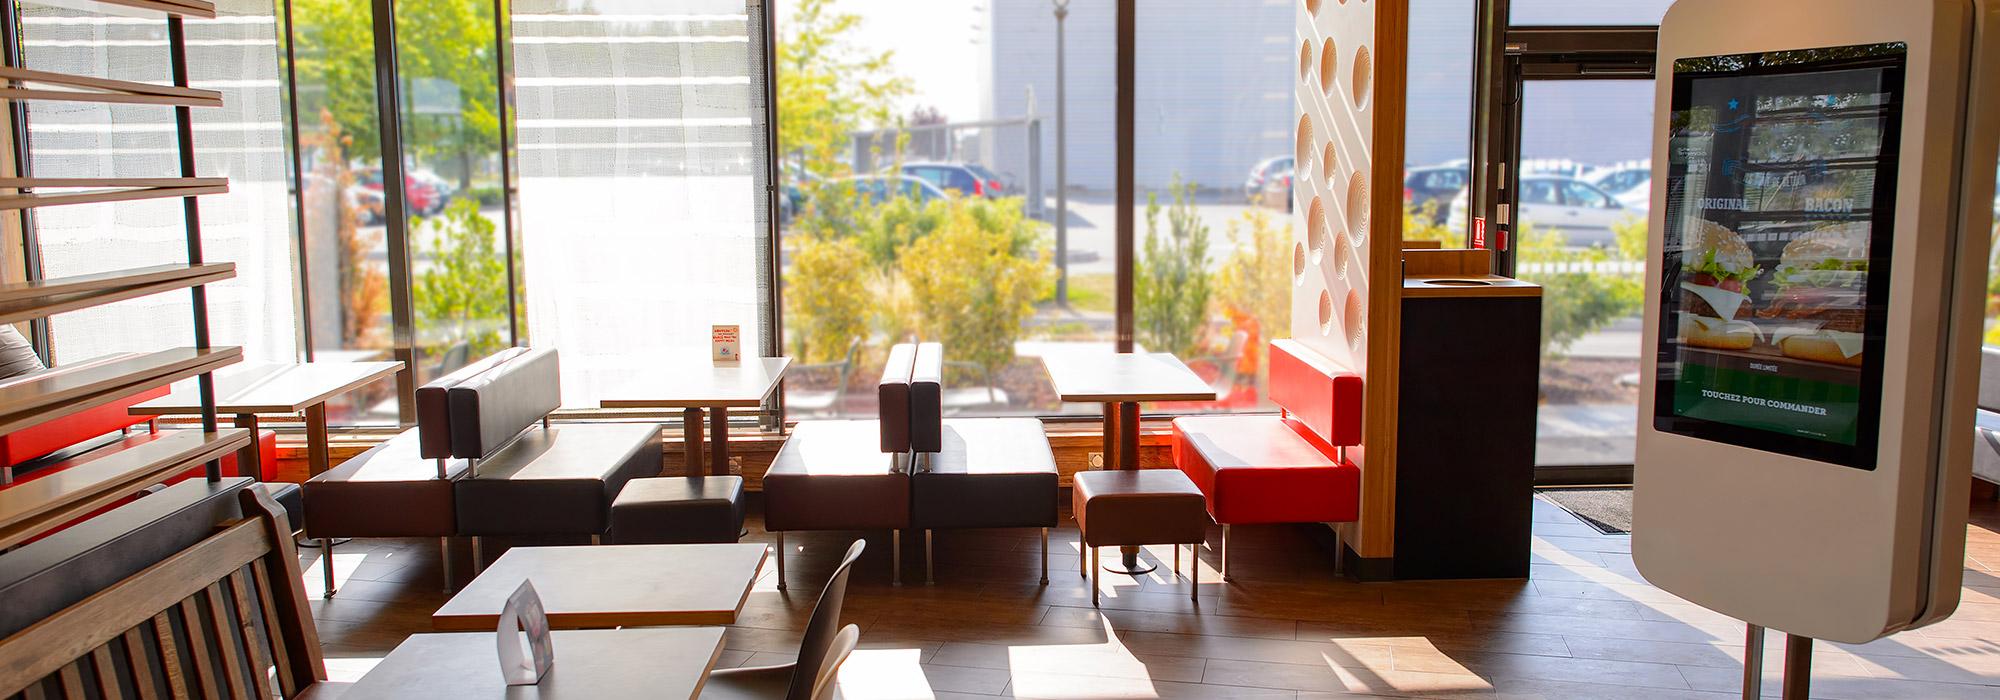 Restaurant-2000×700